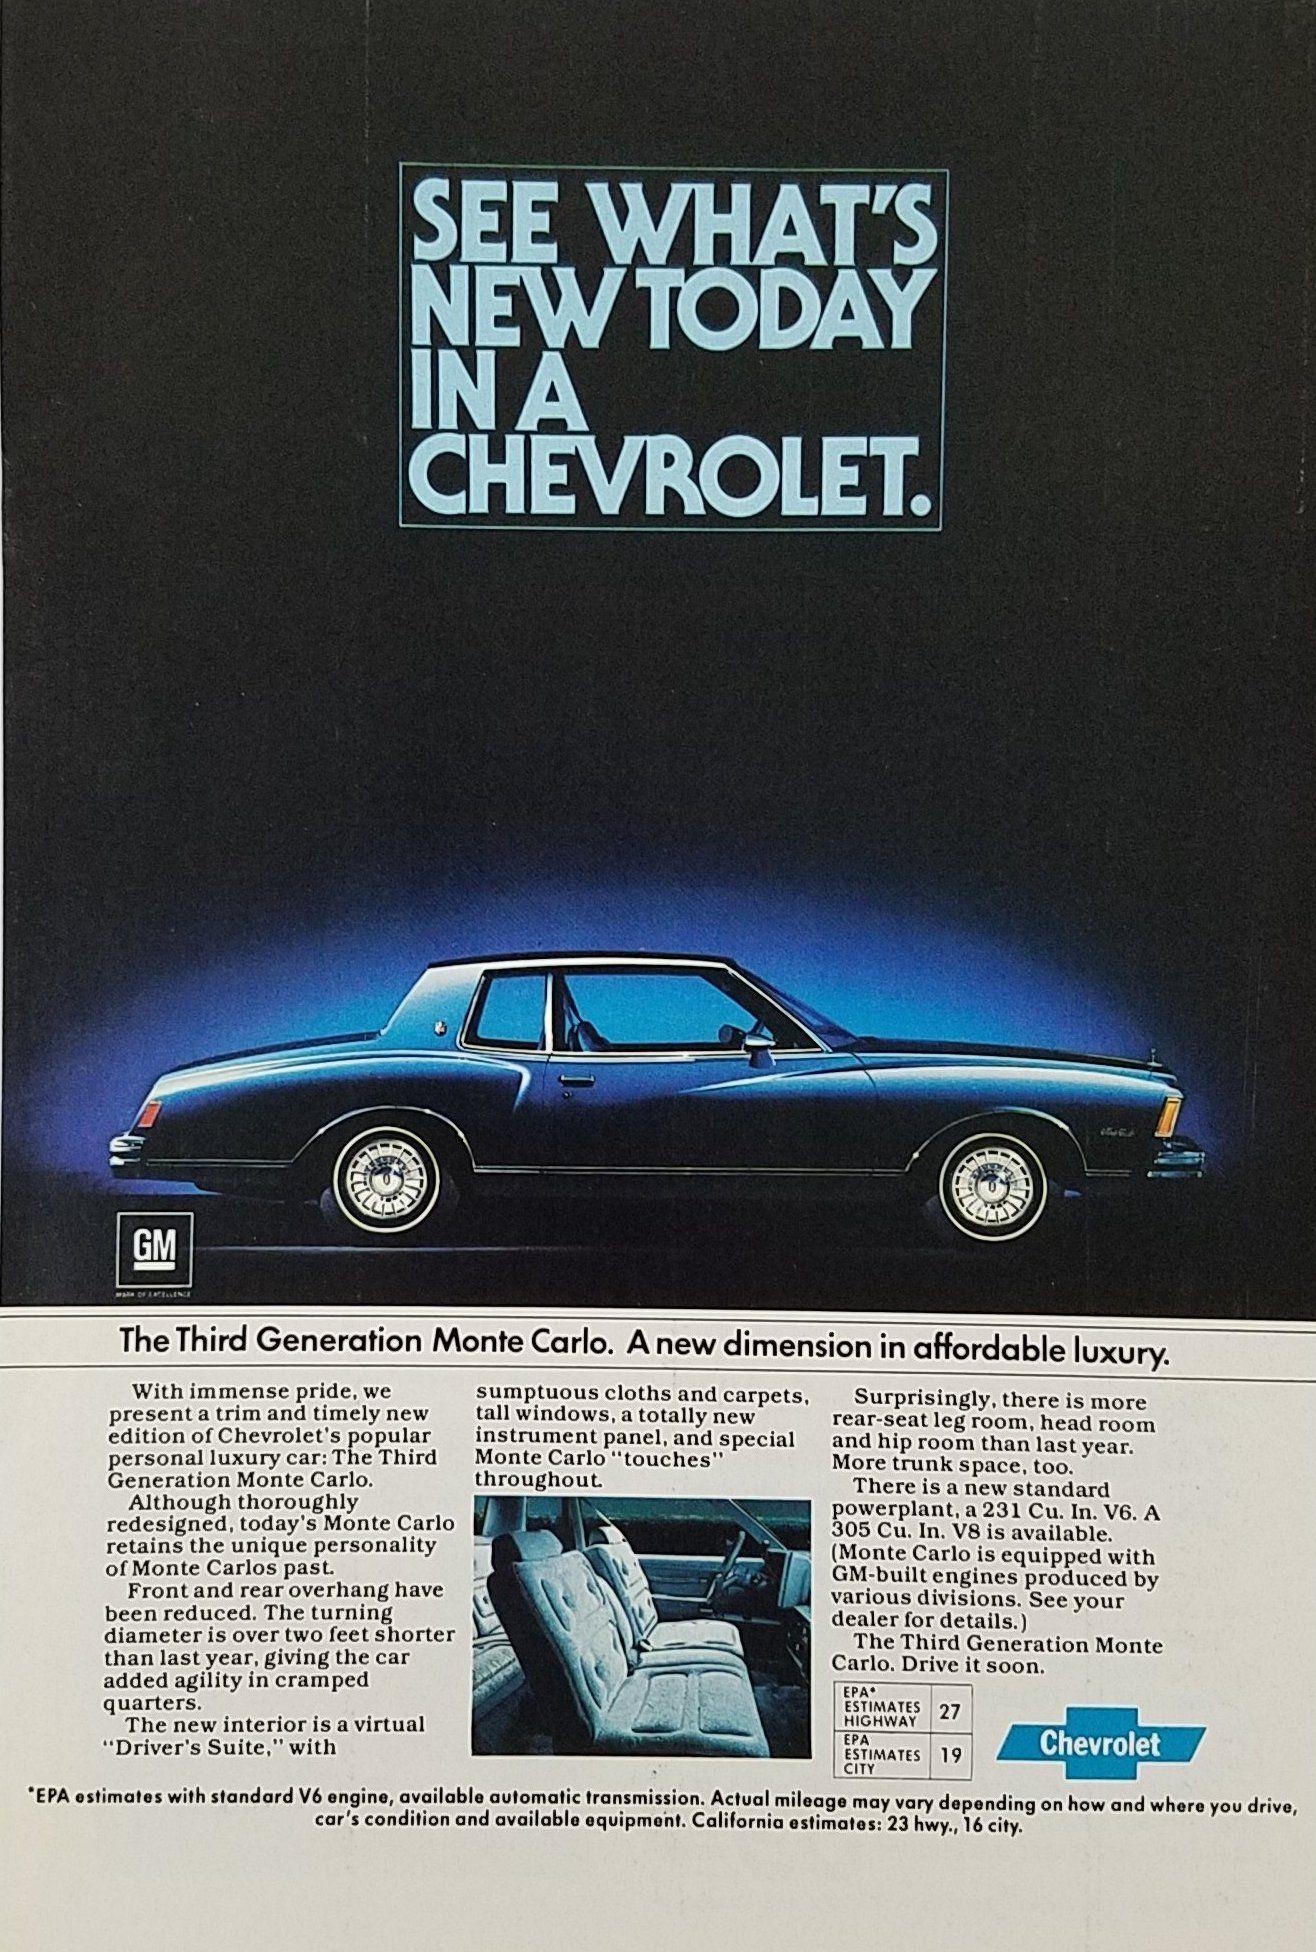 1979 Chevrolet Monte Carlo Magazine Ad Reproduction 8x12 Aluminum Sign